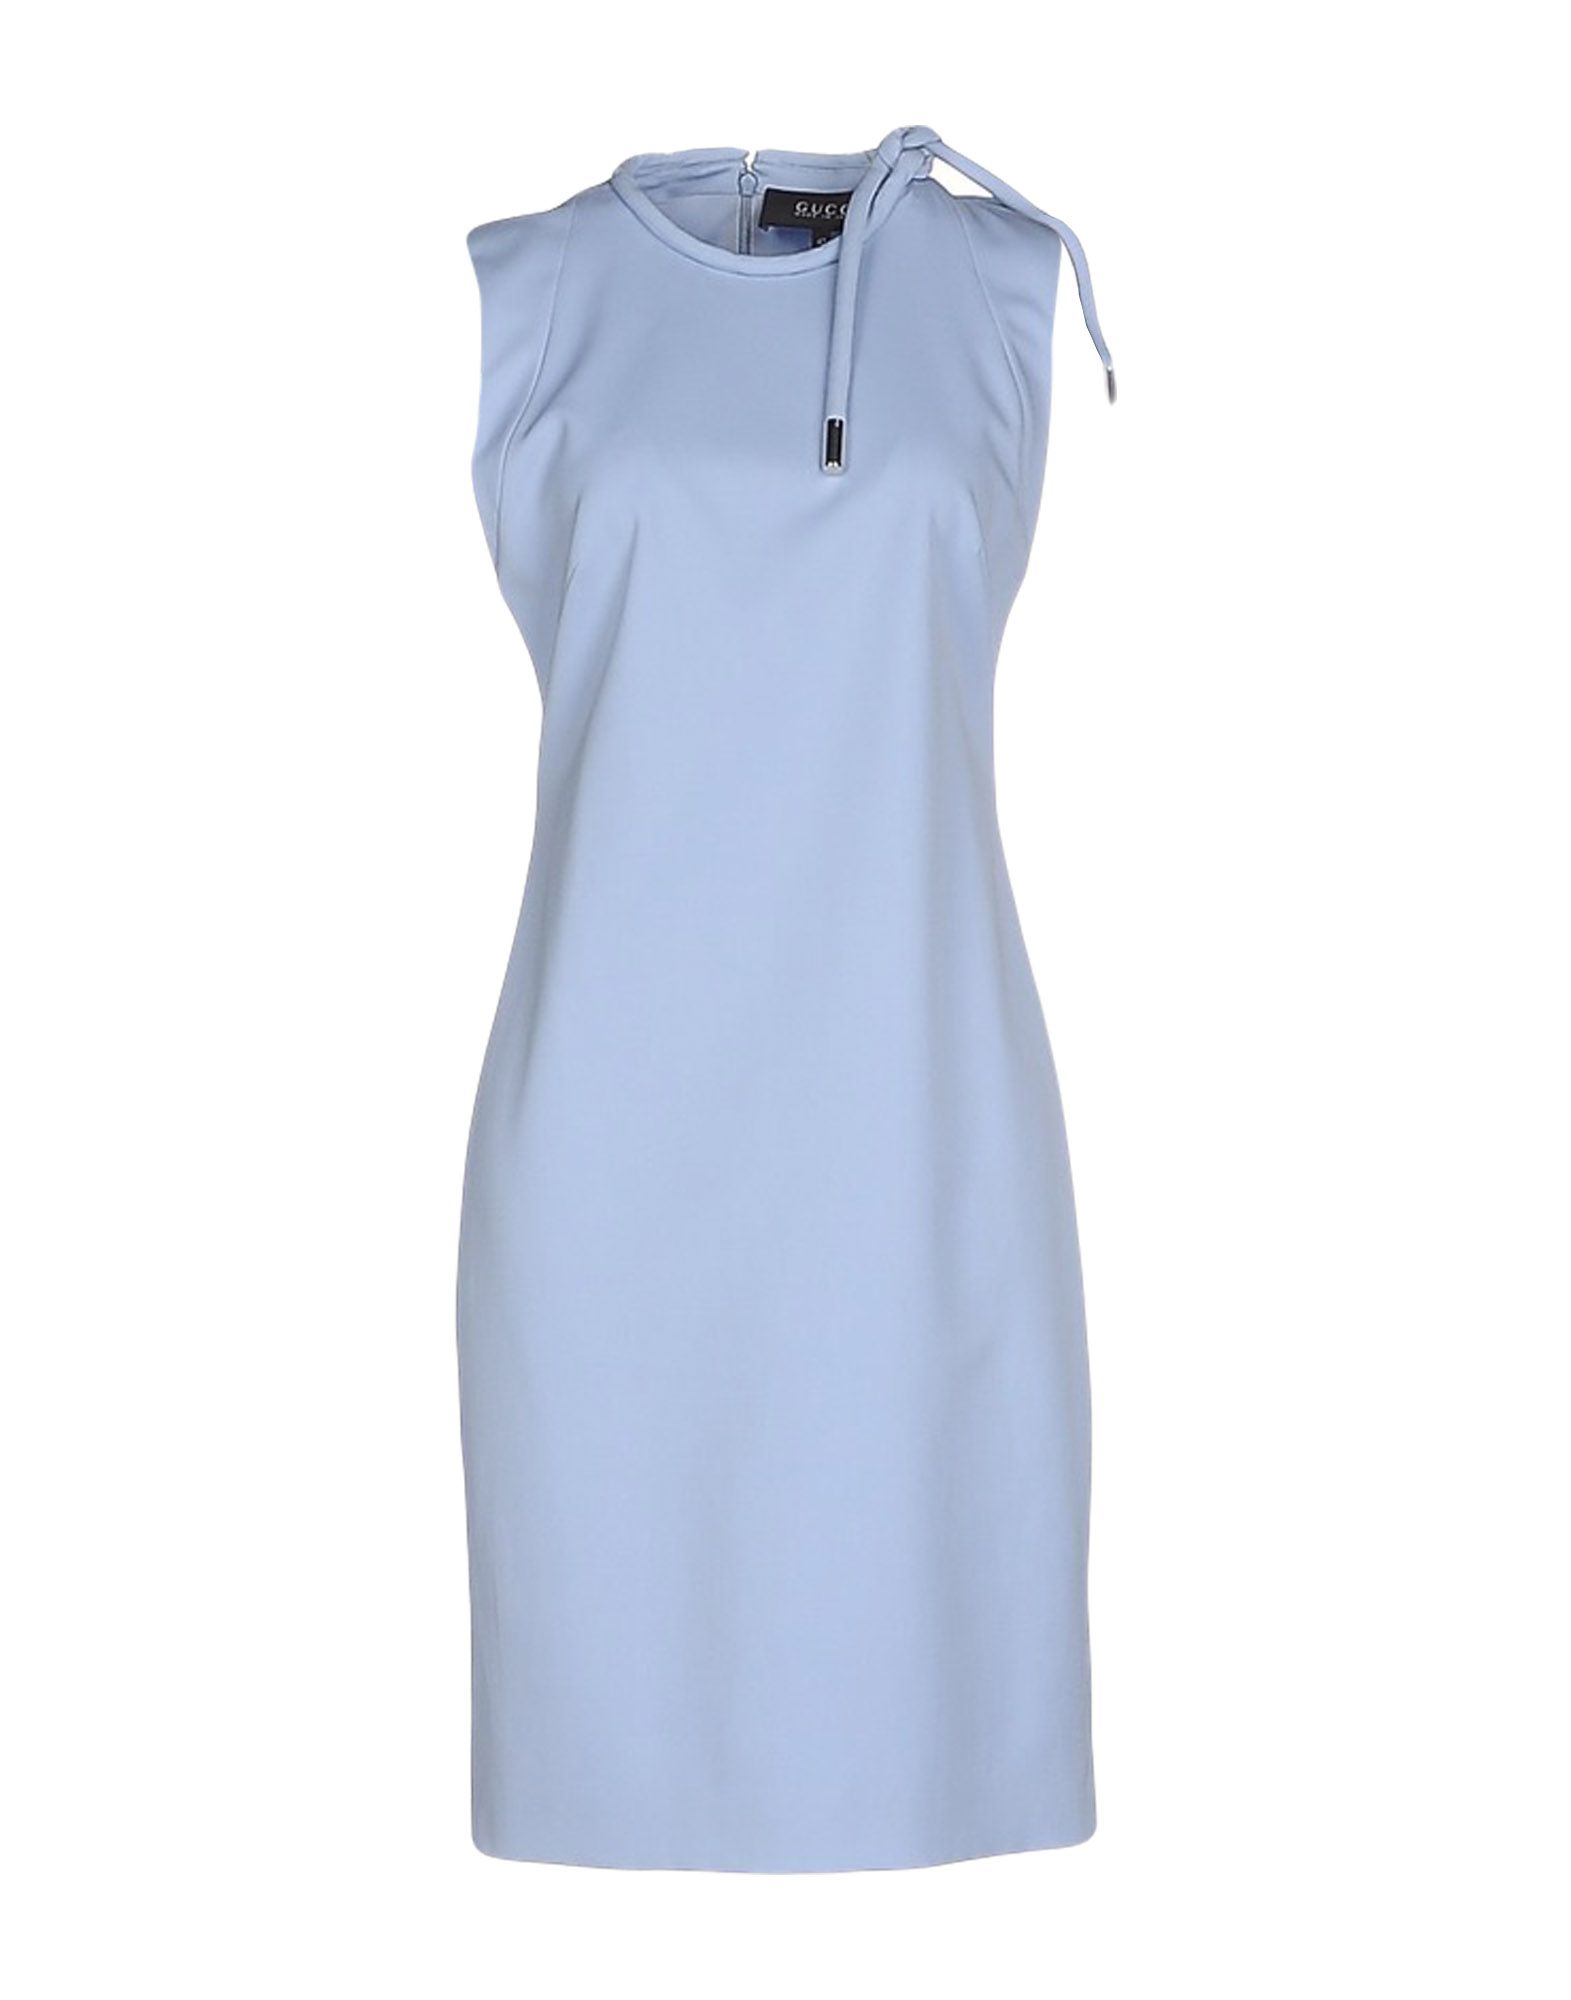 GUCCI Damen Knielanges Kleid Farbe Himmelblau Größe 4